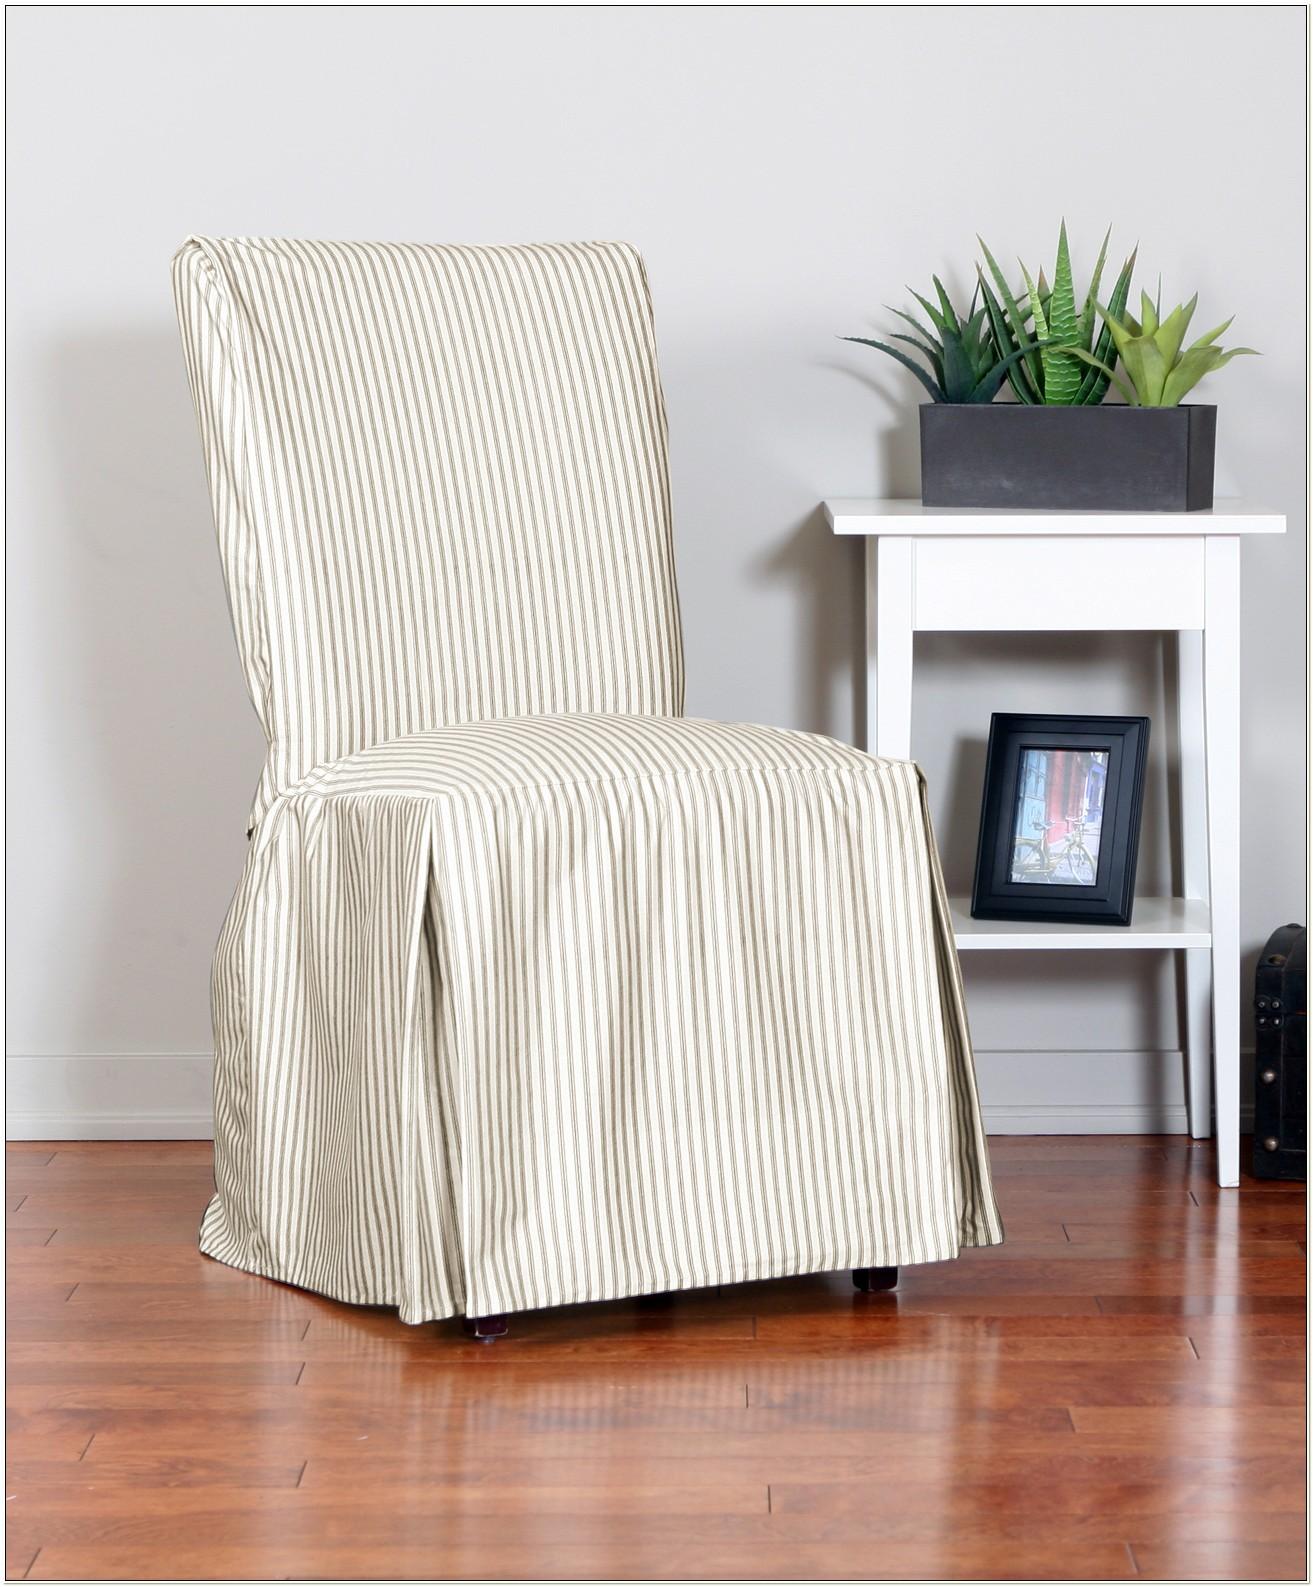 Ticking Stripe Dining Chair Slipcover